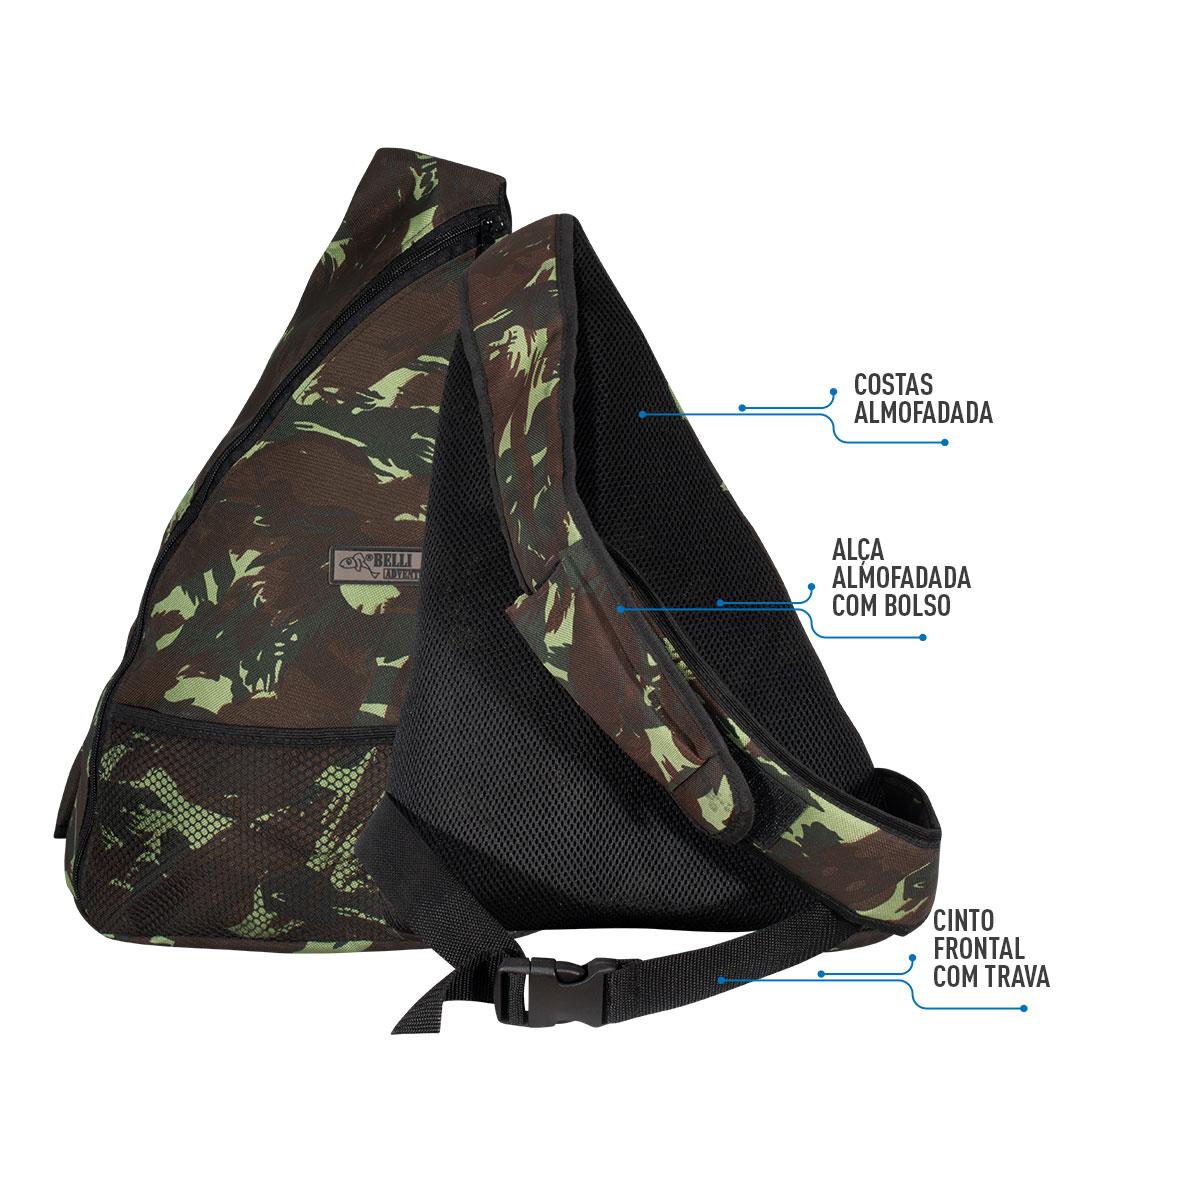 Mochila bolsa atletic camuflada impermeável nylon 600